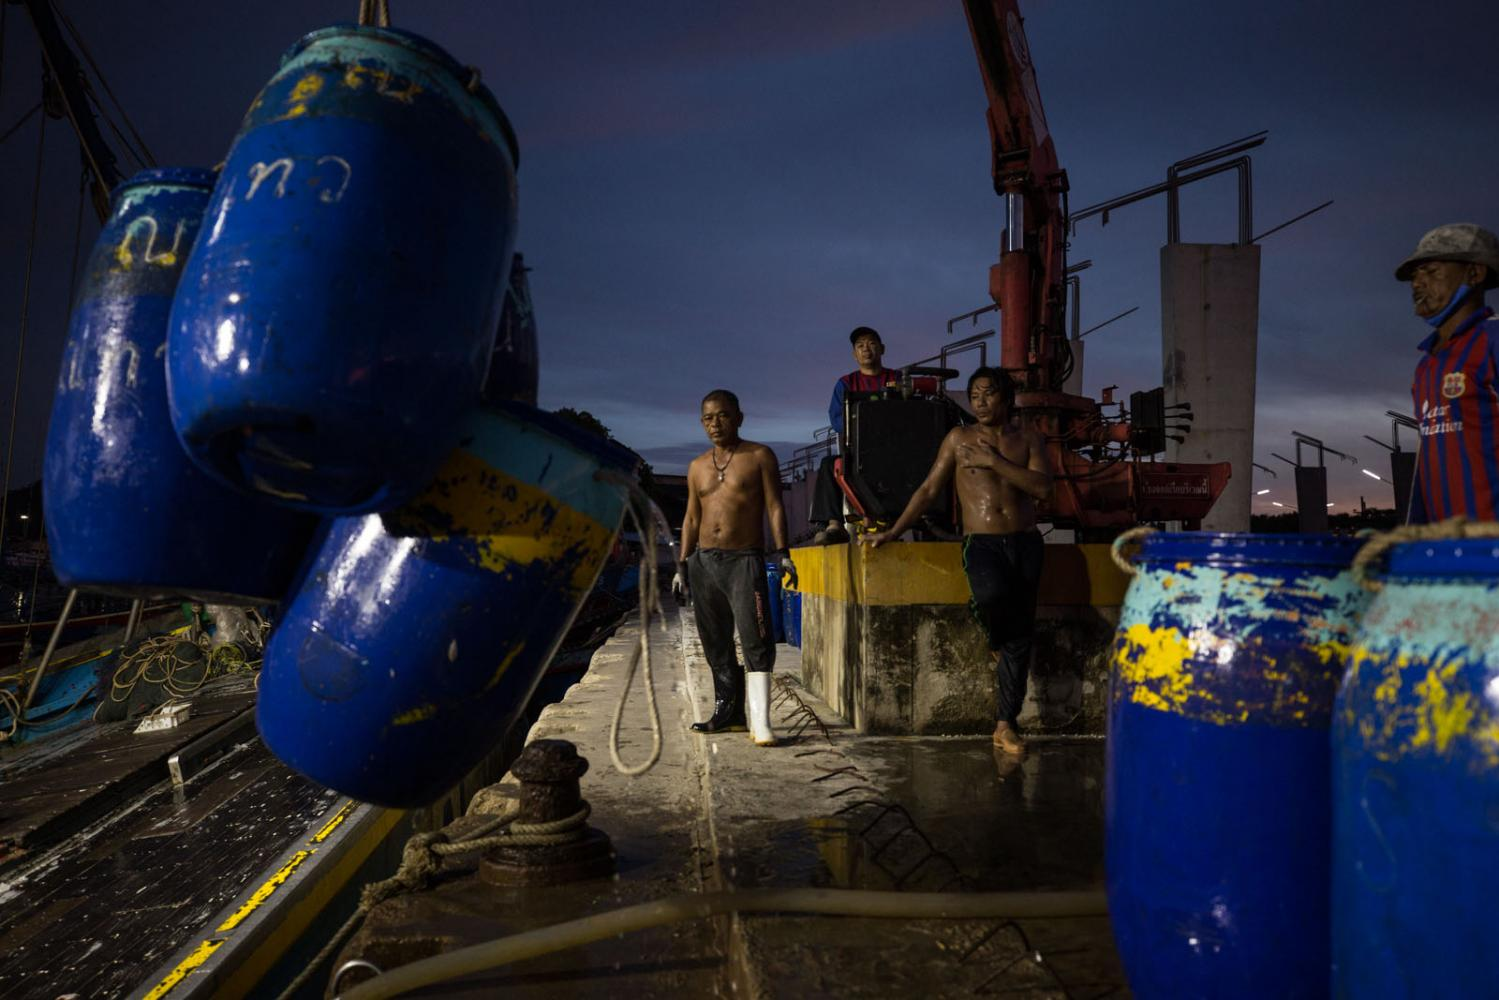 Trawler fishermen unload their catch at dawn at Phukets main fishing harbour. Thailand.